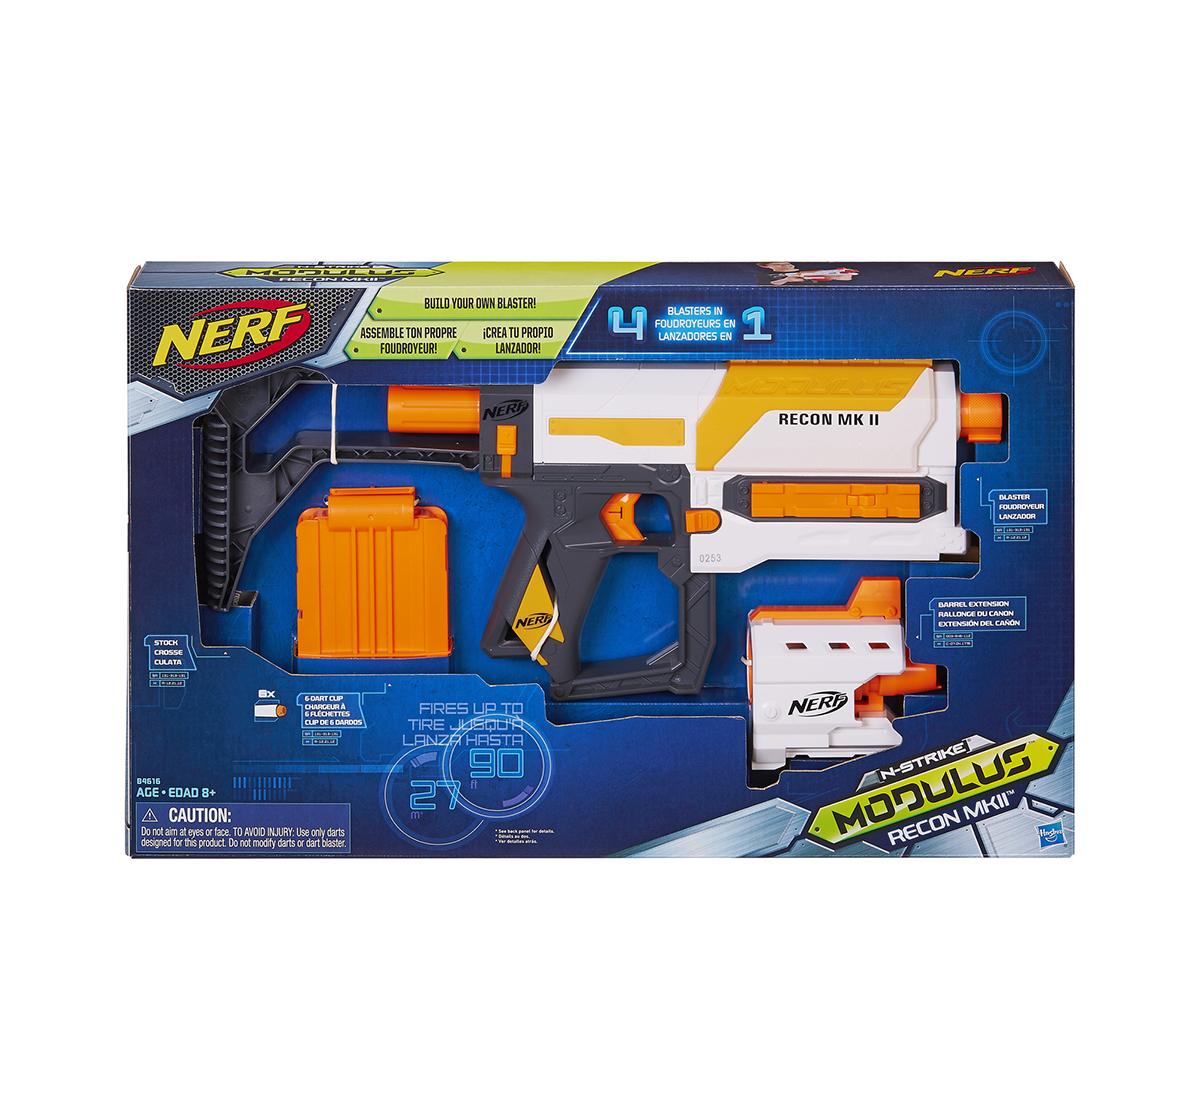 Nerf | Nerf Modulus Recon Mkii Blaster Blasters for Boys age 8Y+